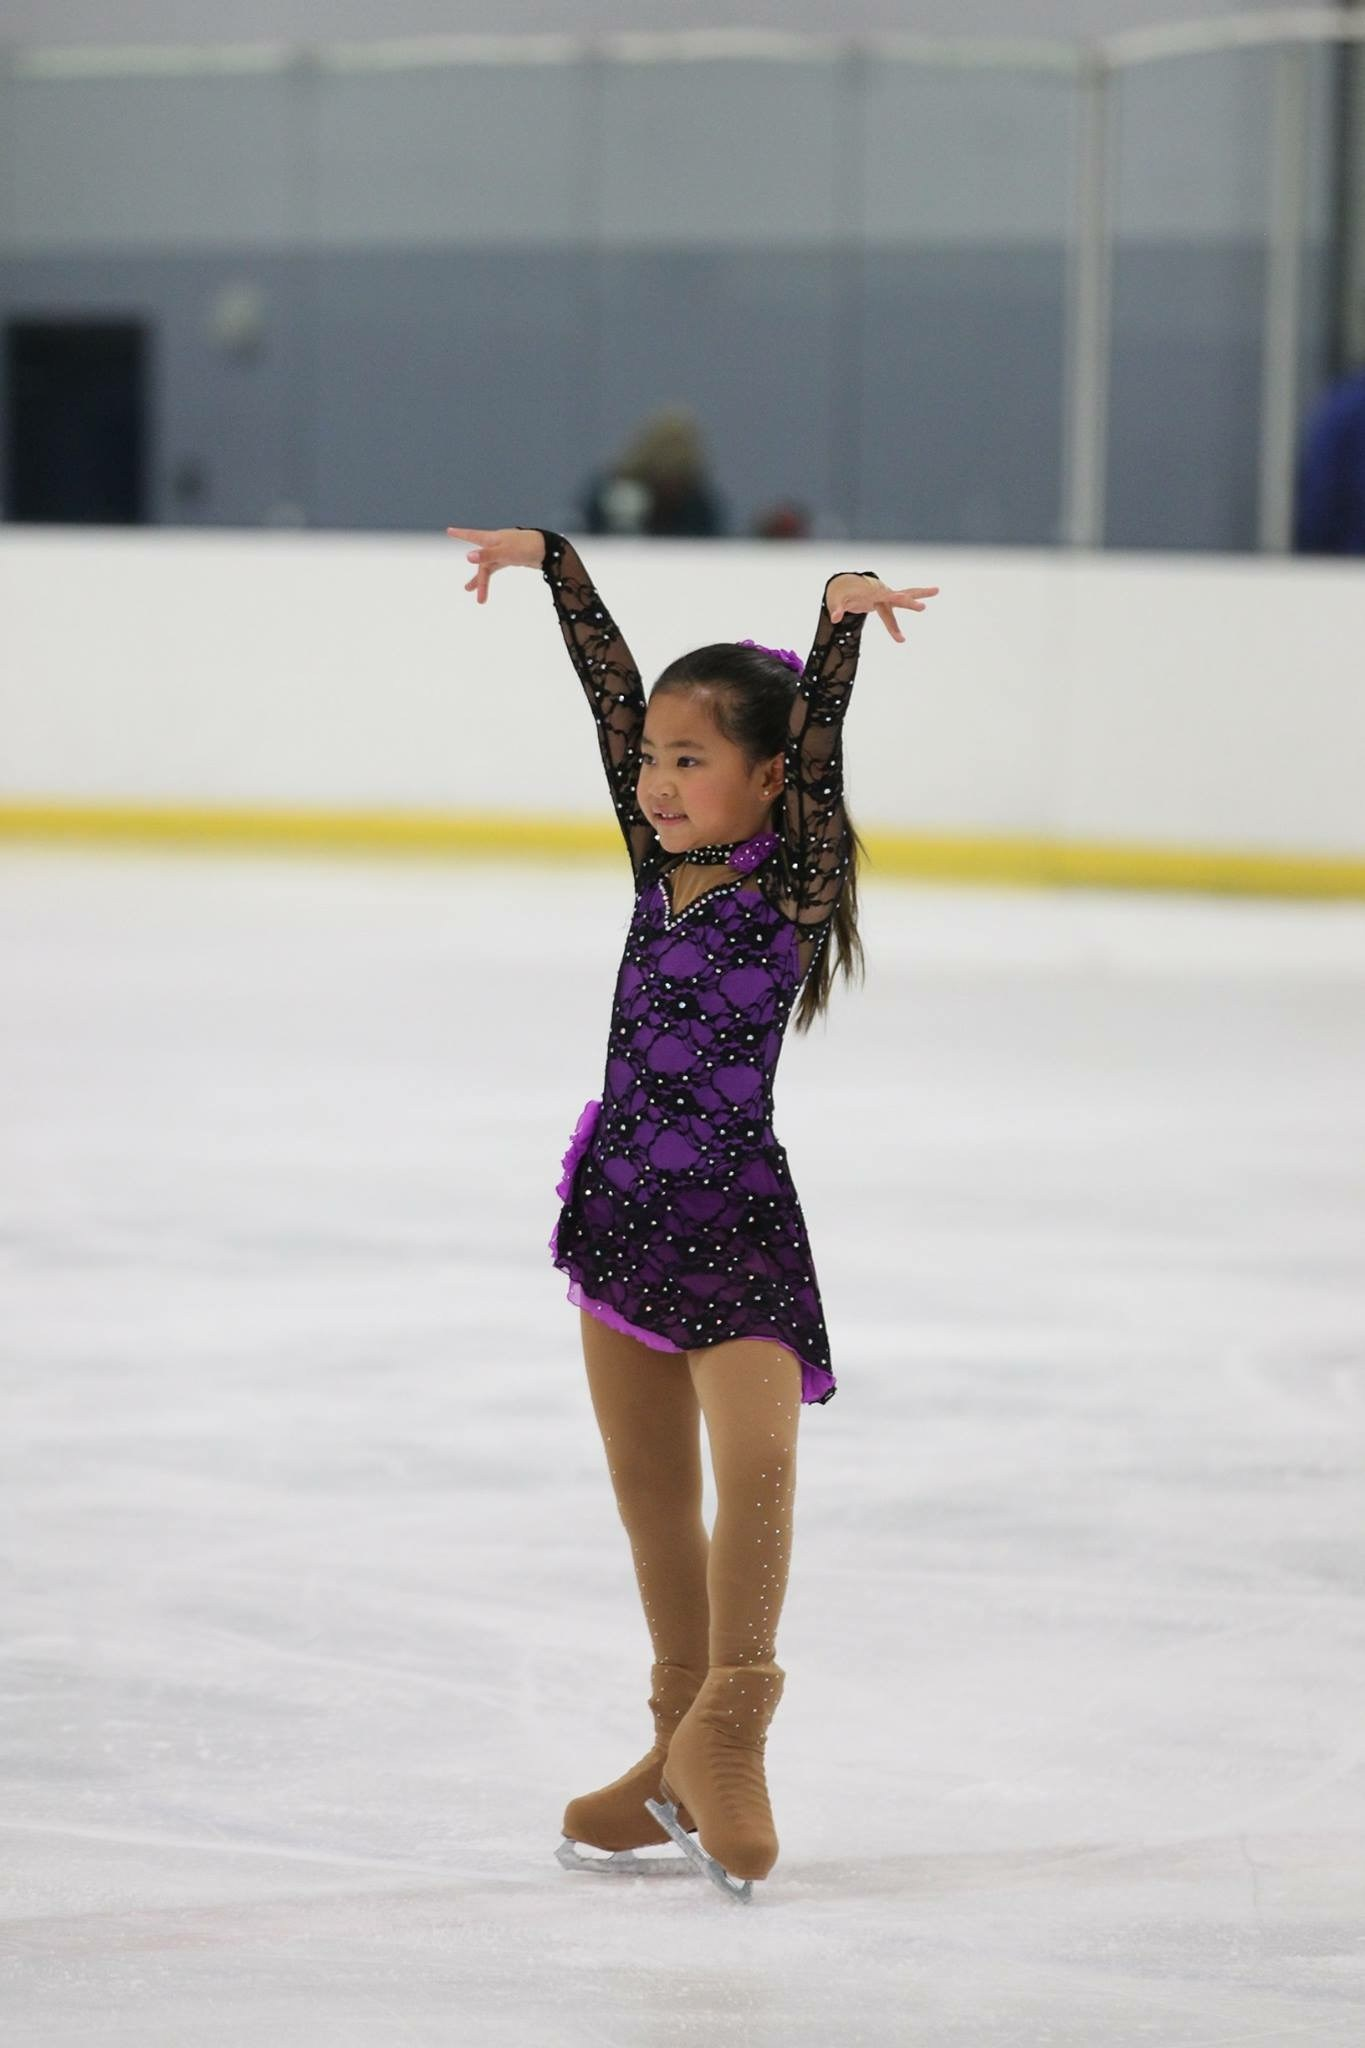 Student ice skating